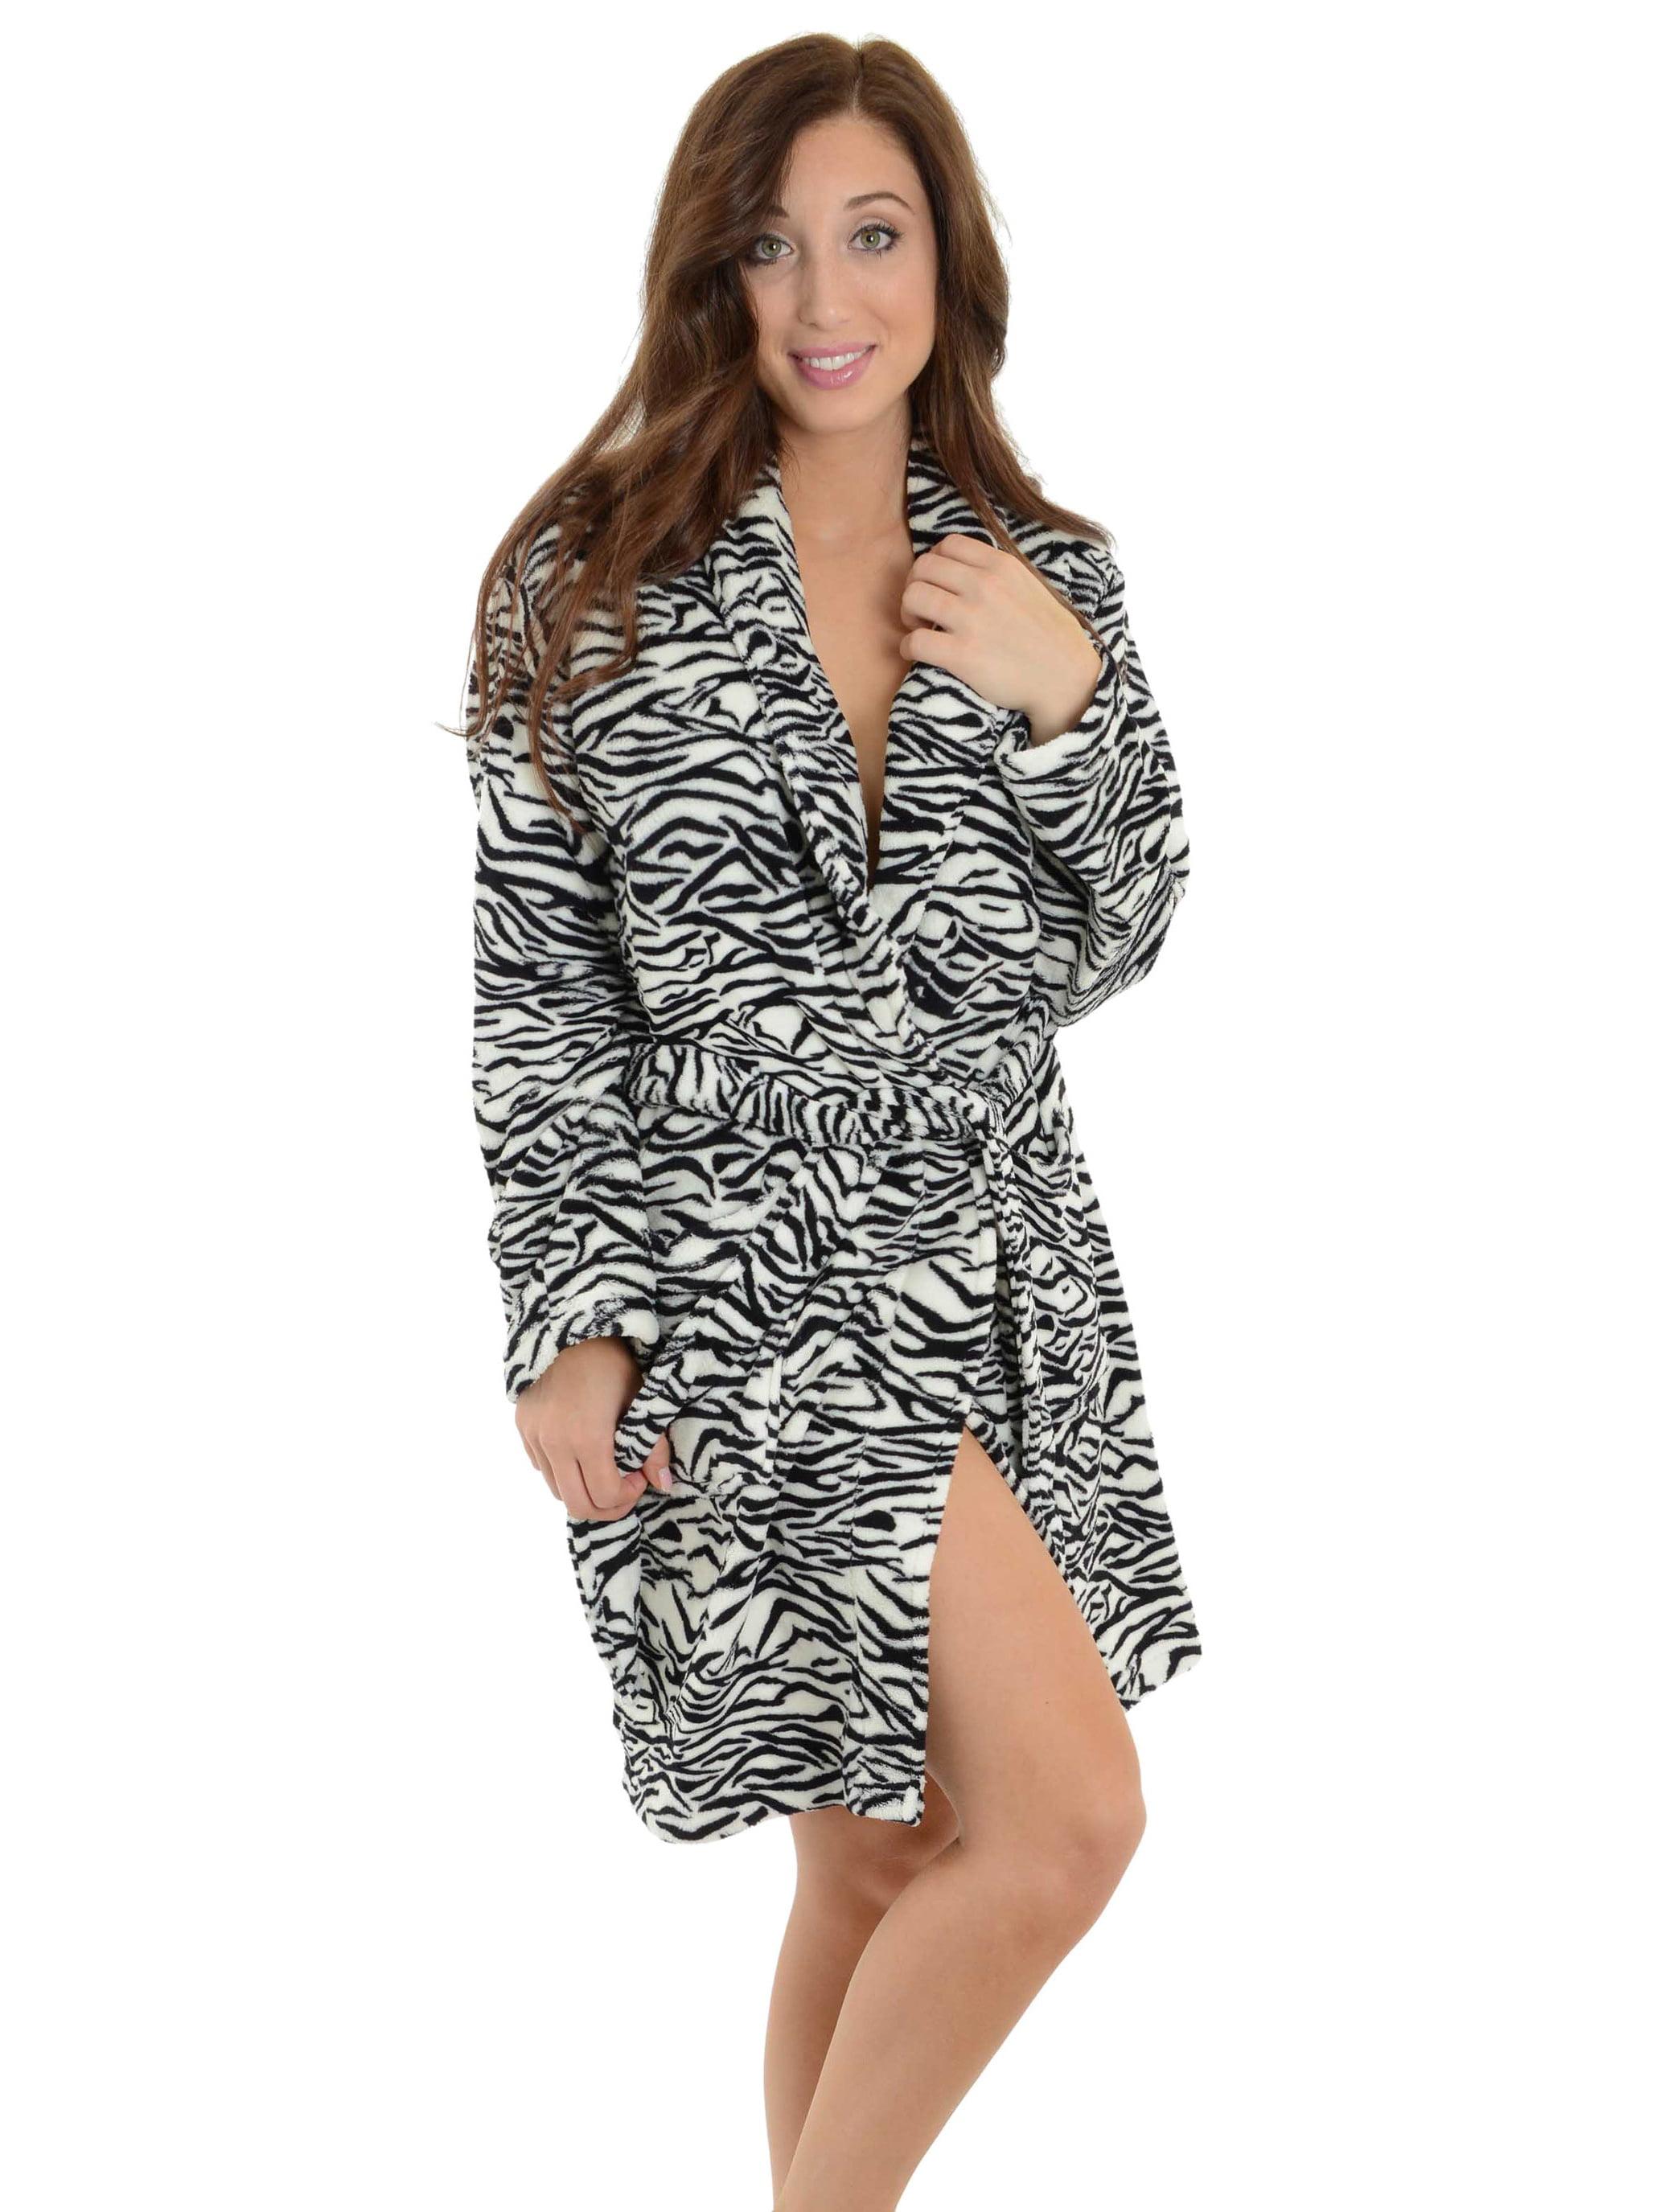 New Ladies Super Soft Animal Print ZEBRA Dressing gown robe wrap Black White